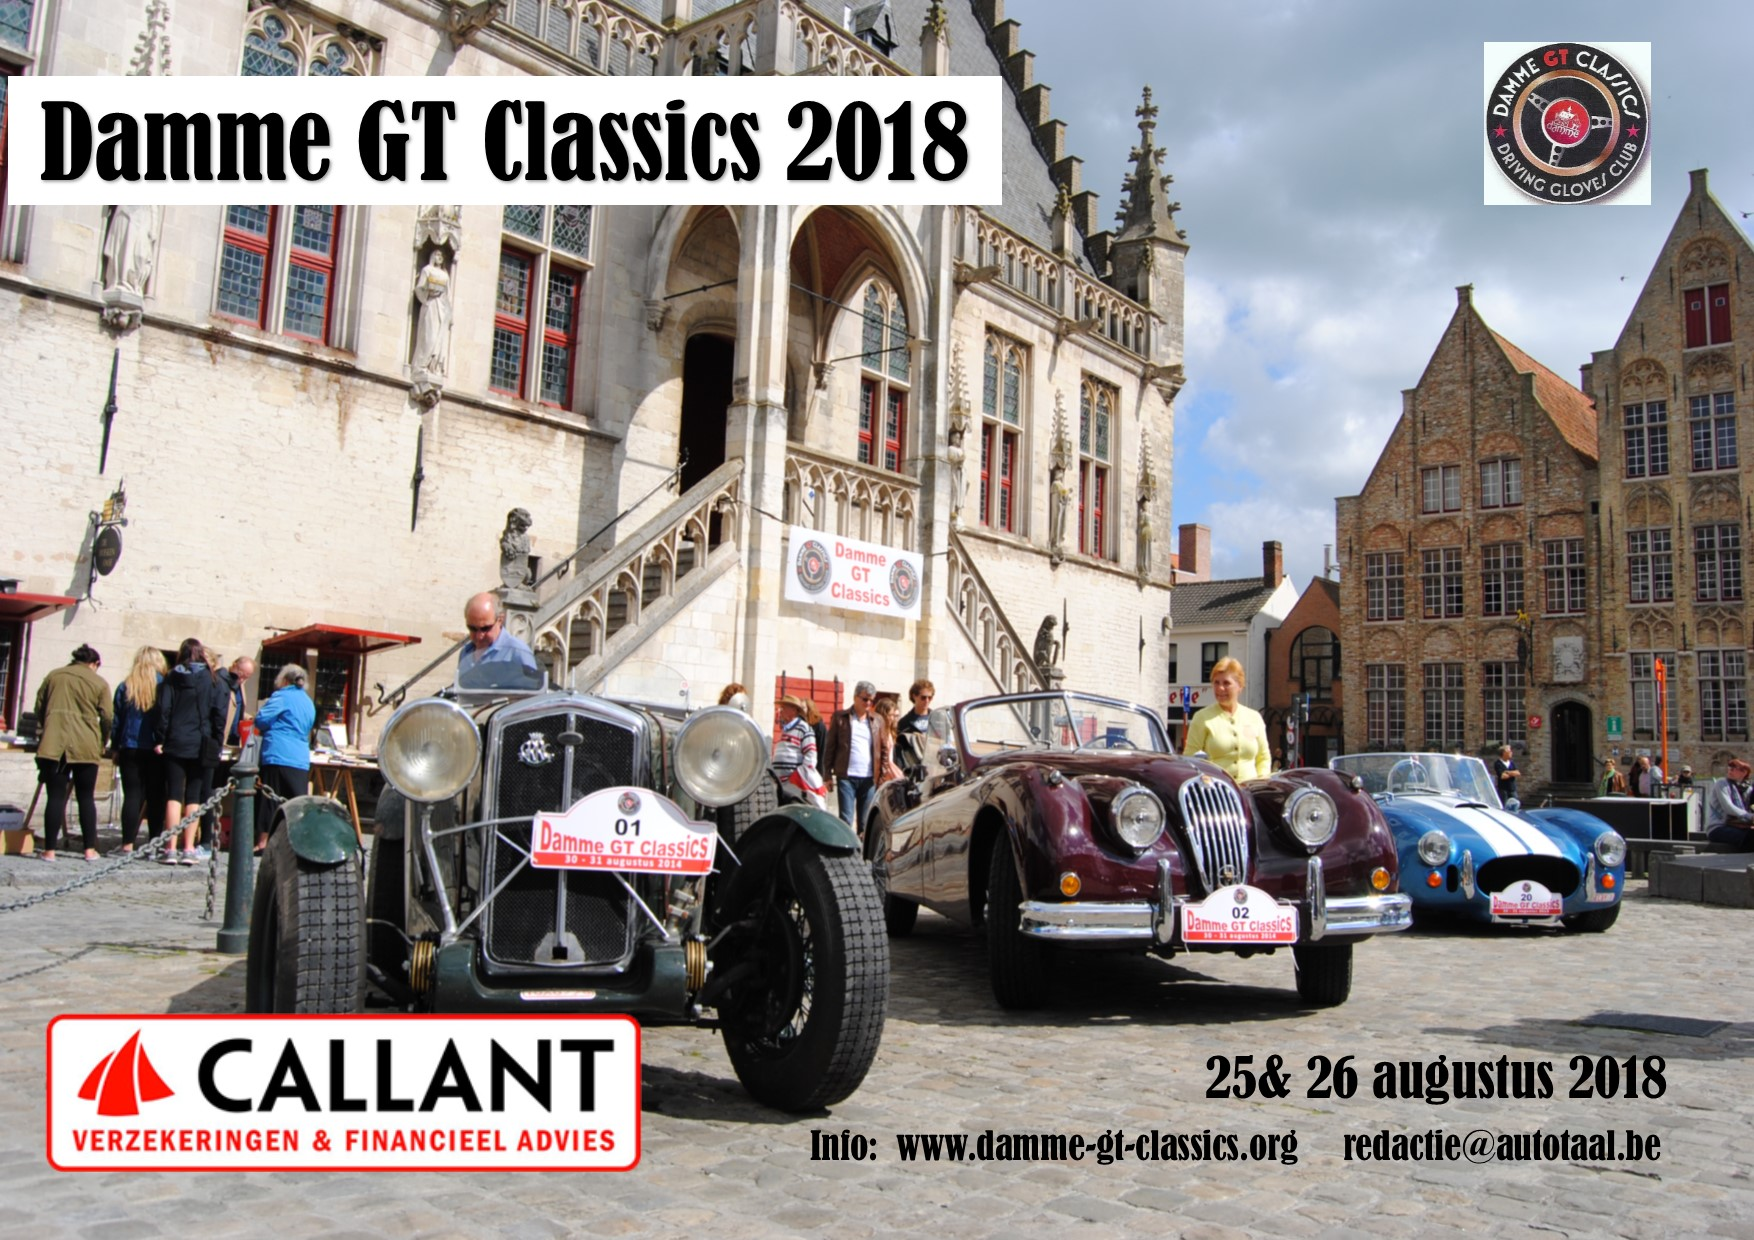 Damme GT Classics 2018 Dag 1. Alain en Pauline Mervilde